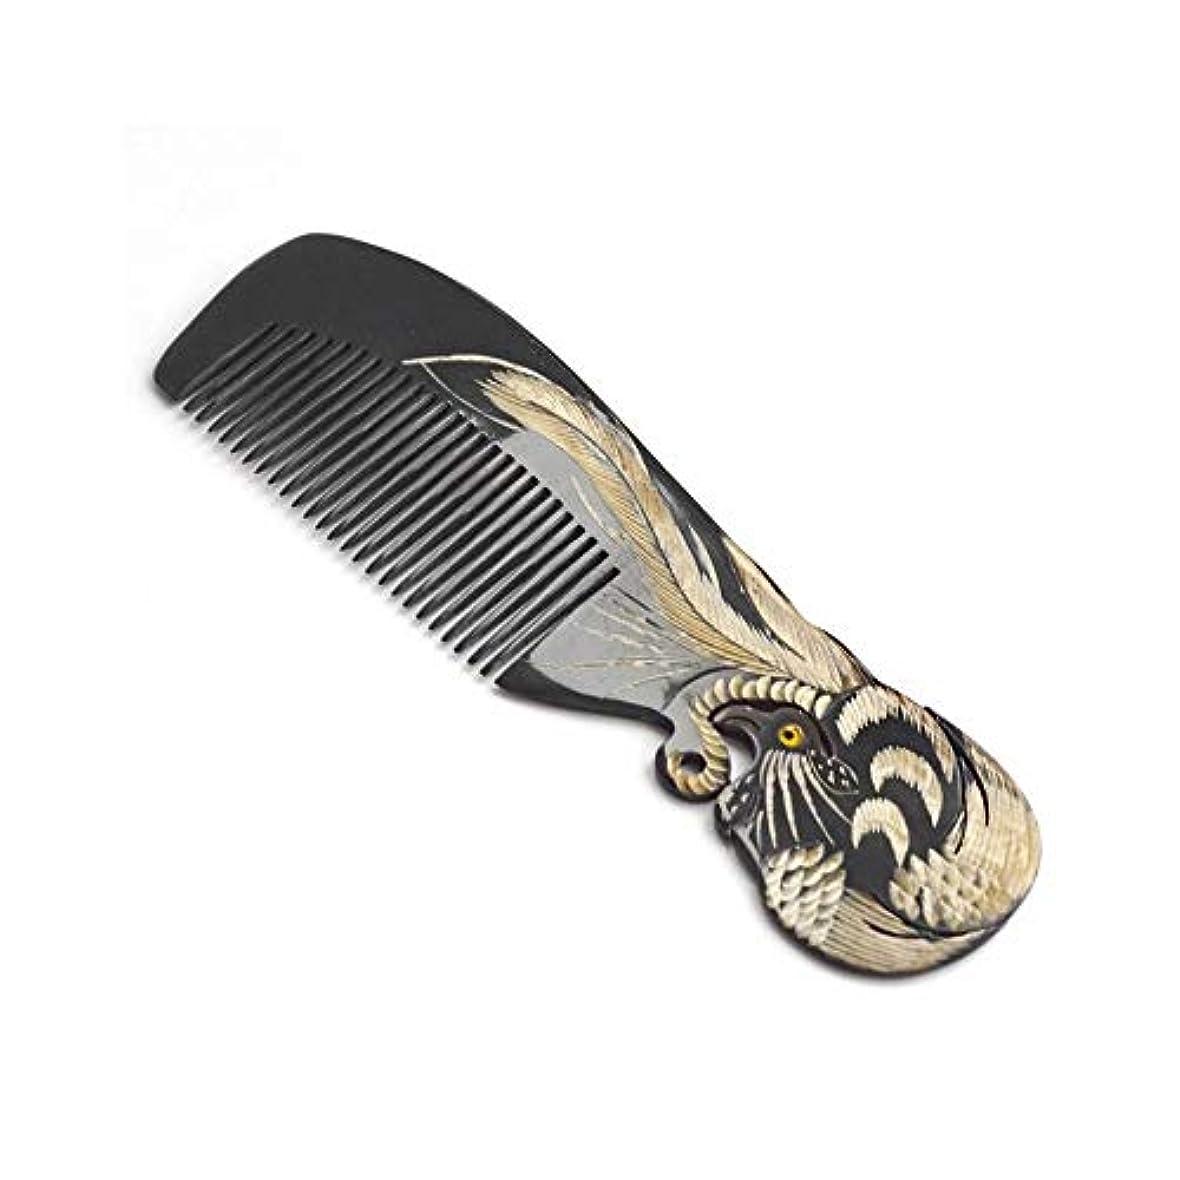 ZYDP 黒髪の櫛の反静的な木の良い歯の櫛 - 天然水牛の角の櫛の孔雀のデザイン (色 : 099B)